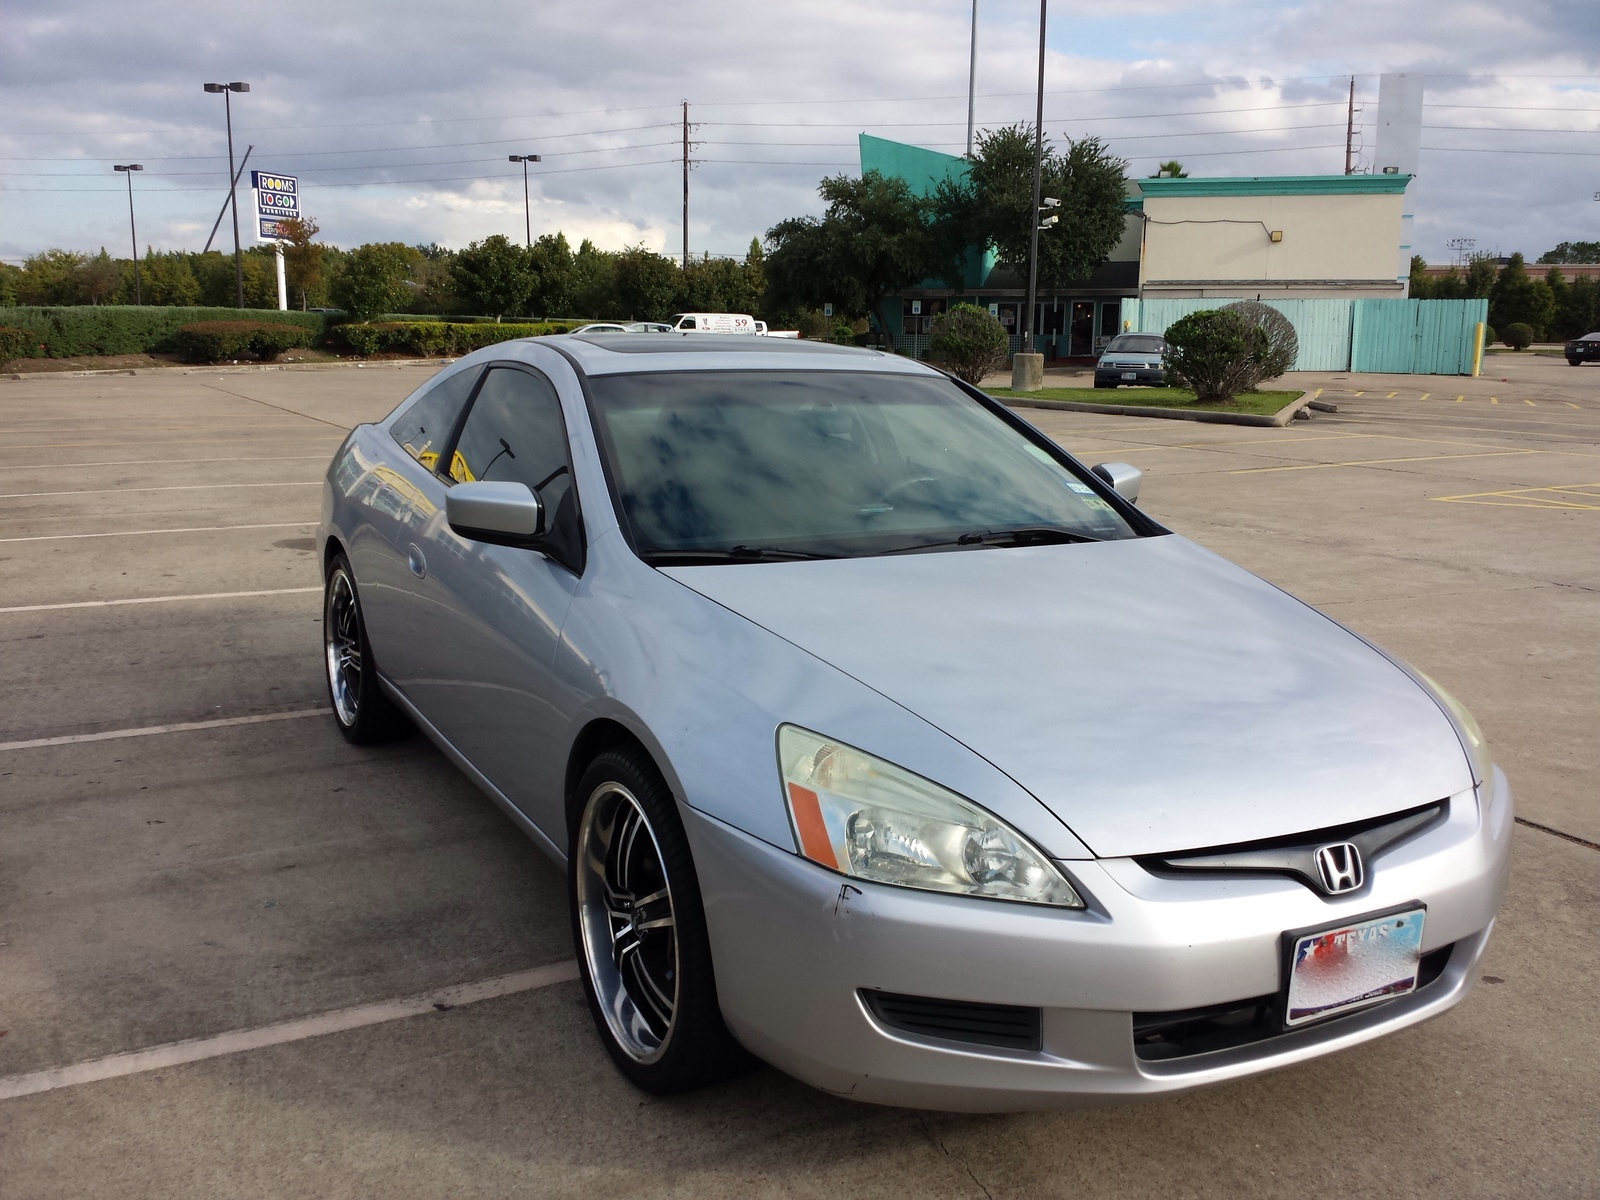 2004 Honda Accord - Trim Information - CarGurus